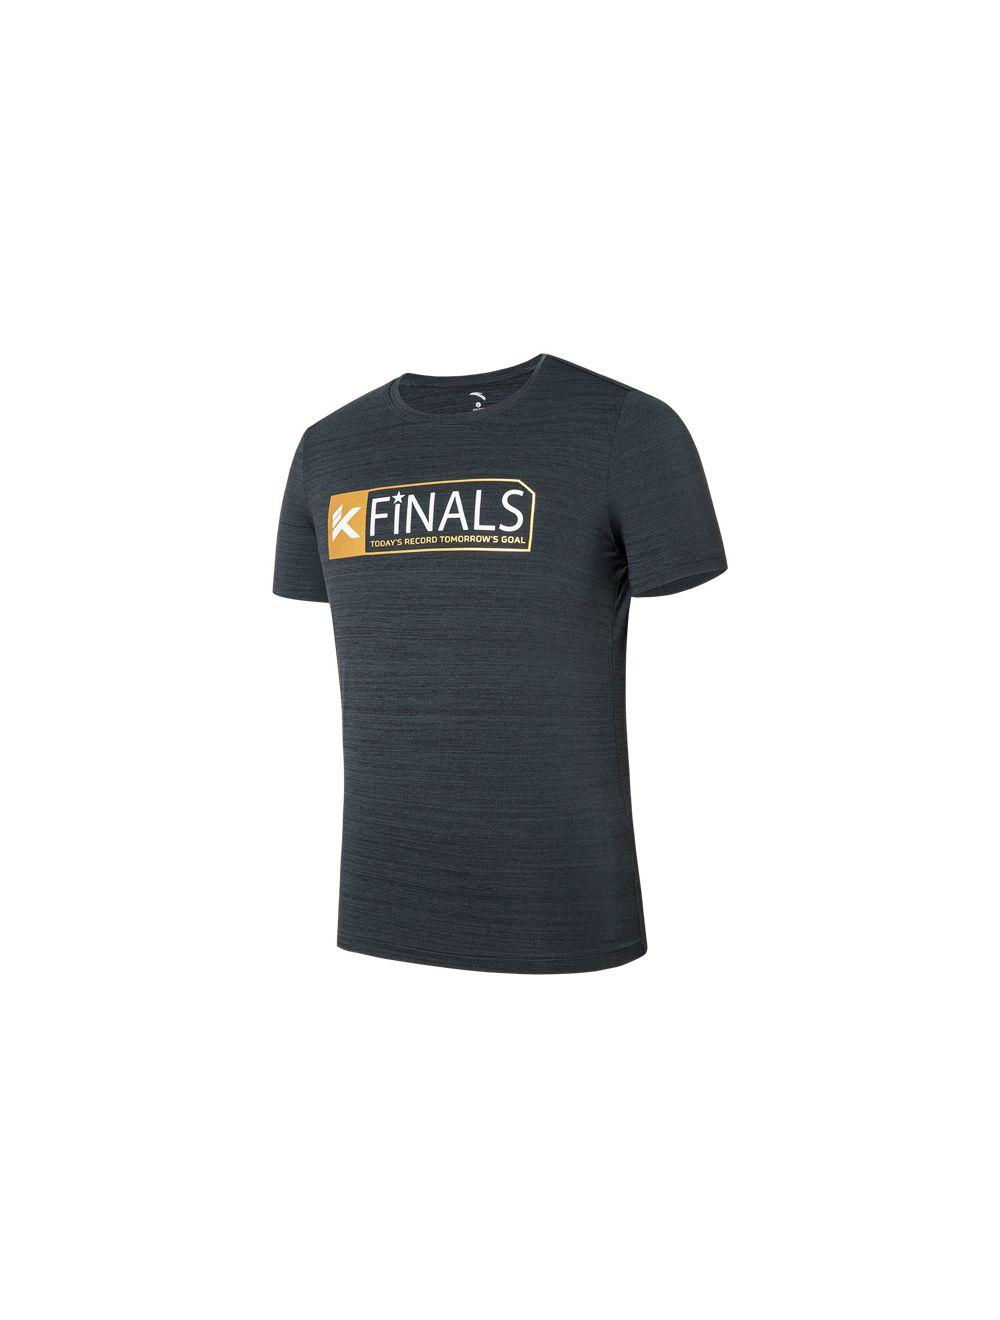 wholesale dealer 8418d 99b02 Anta Klay Thompson China Trip KT Finals Tee shirt - Black